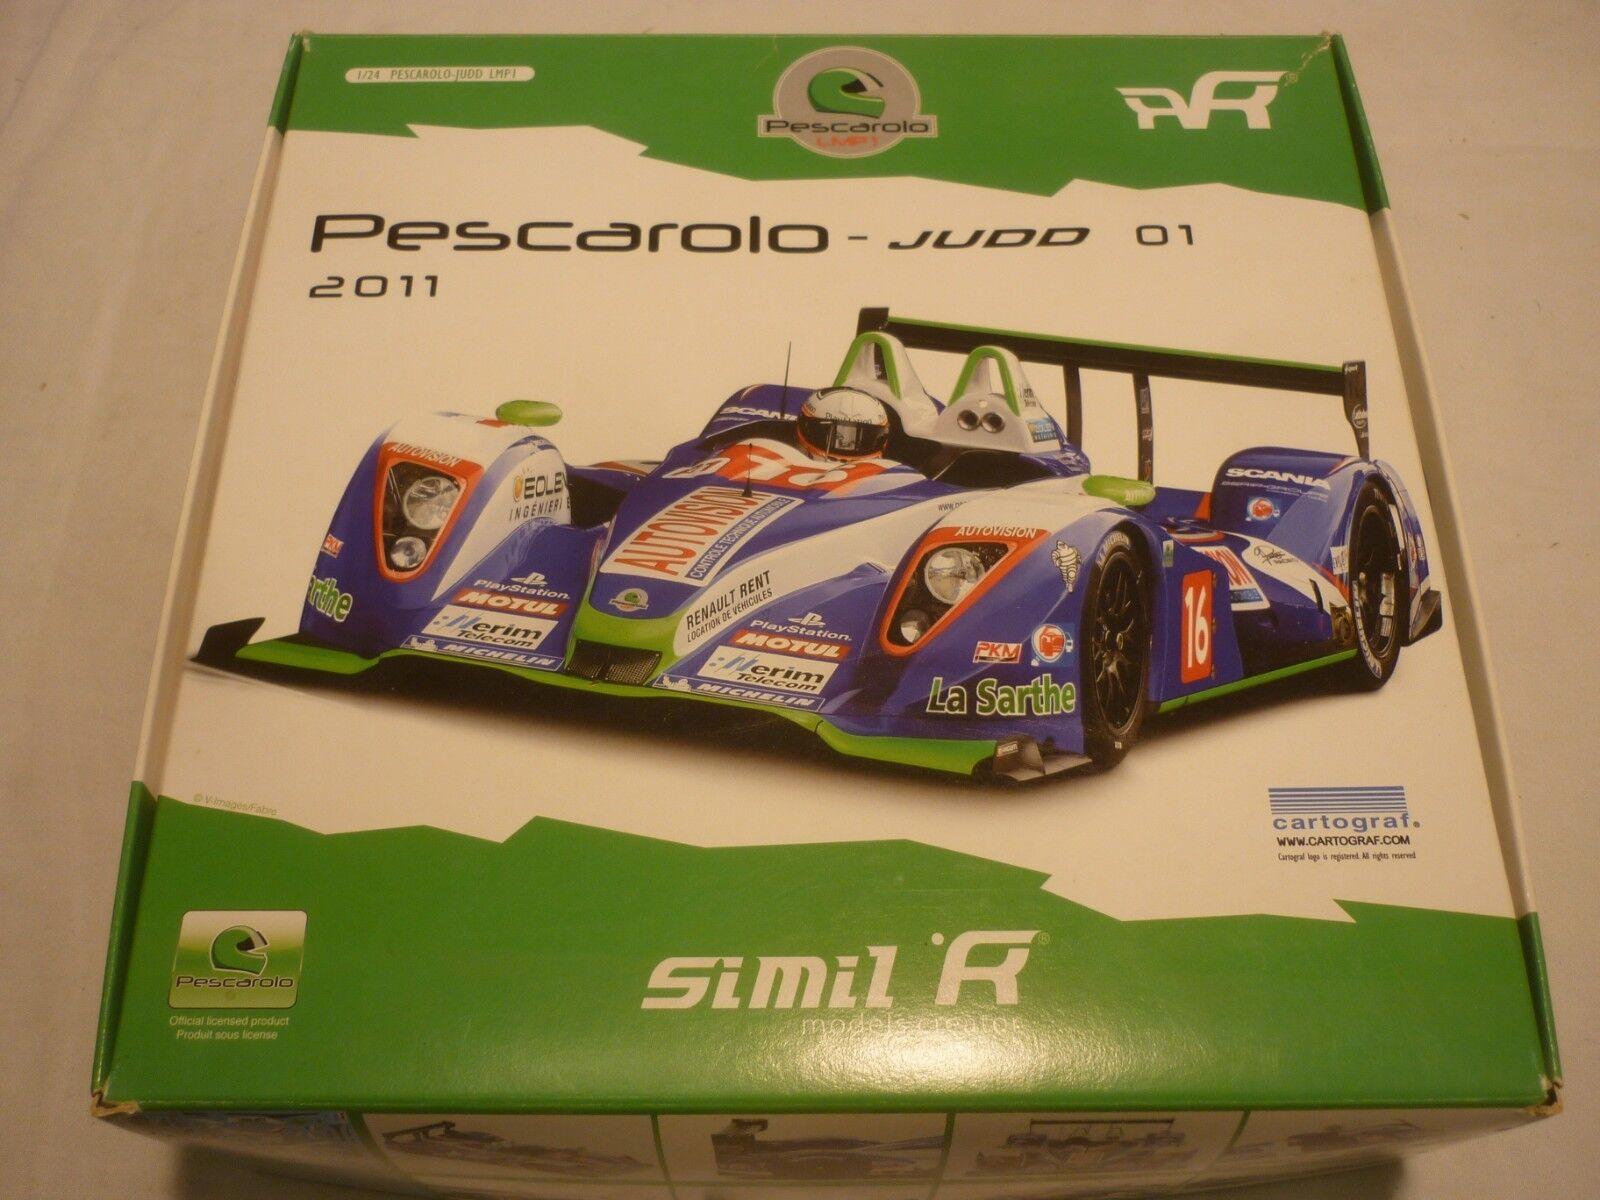 A SIMIL un-built plastic kit of a Pescarolo Judd 01 racing car,  boxed